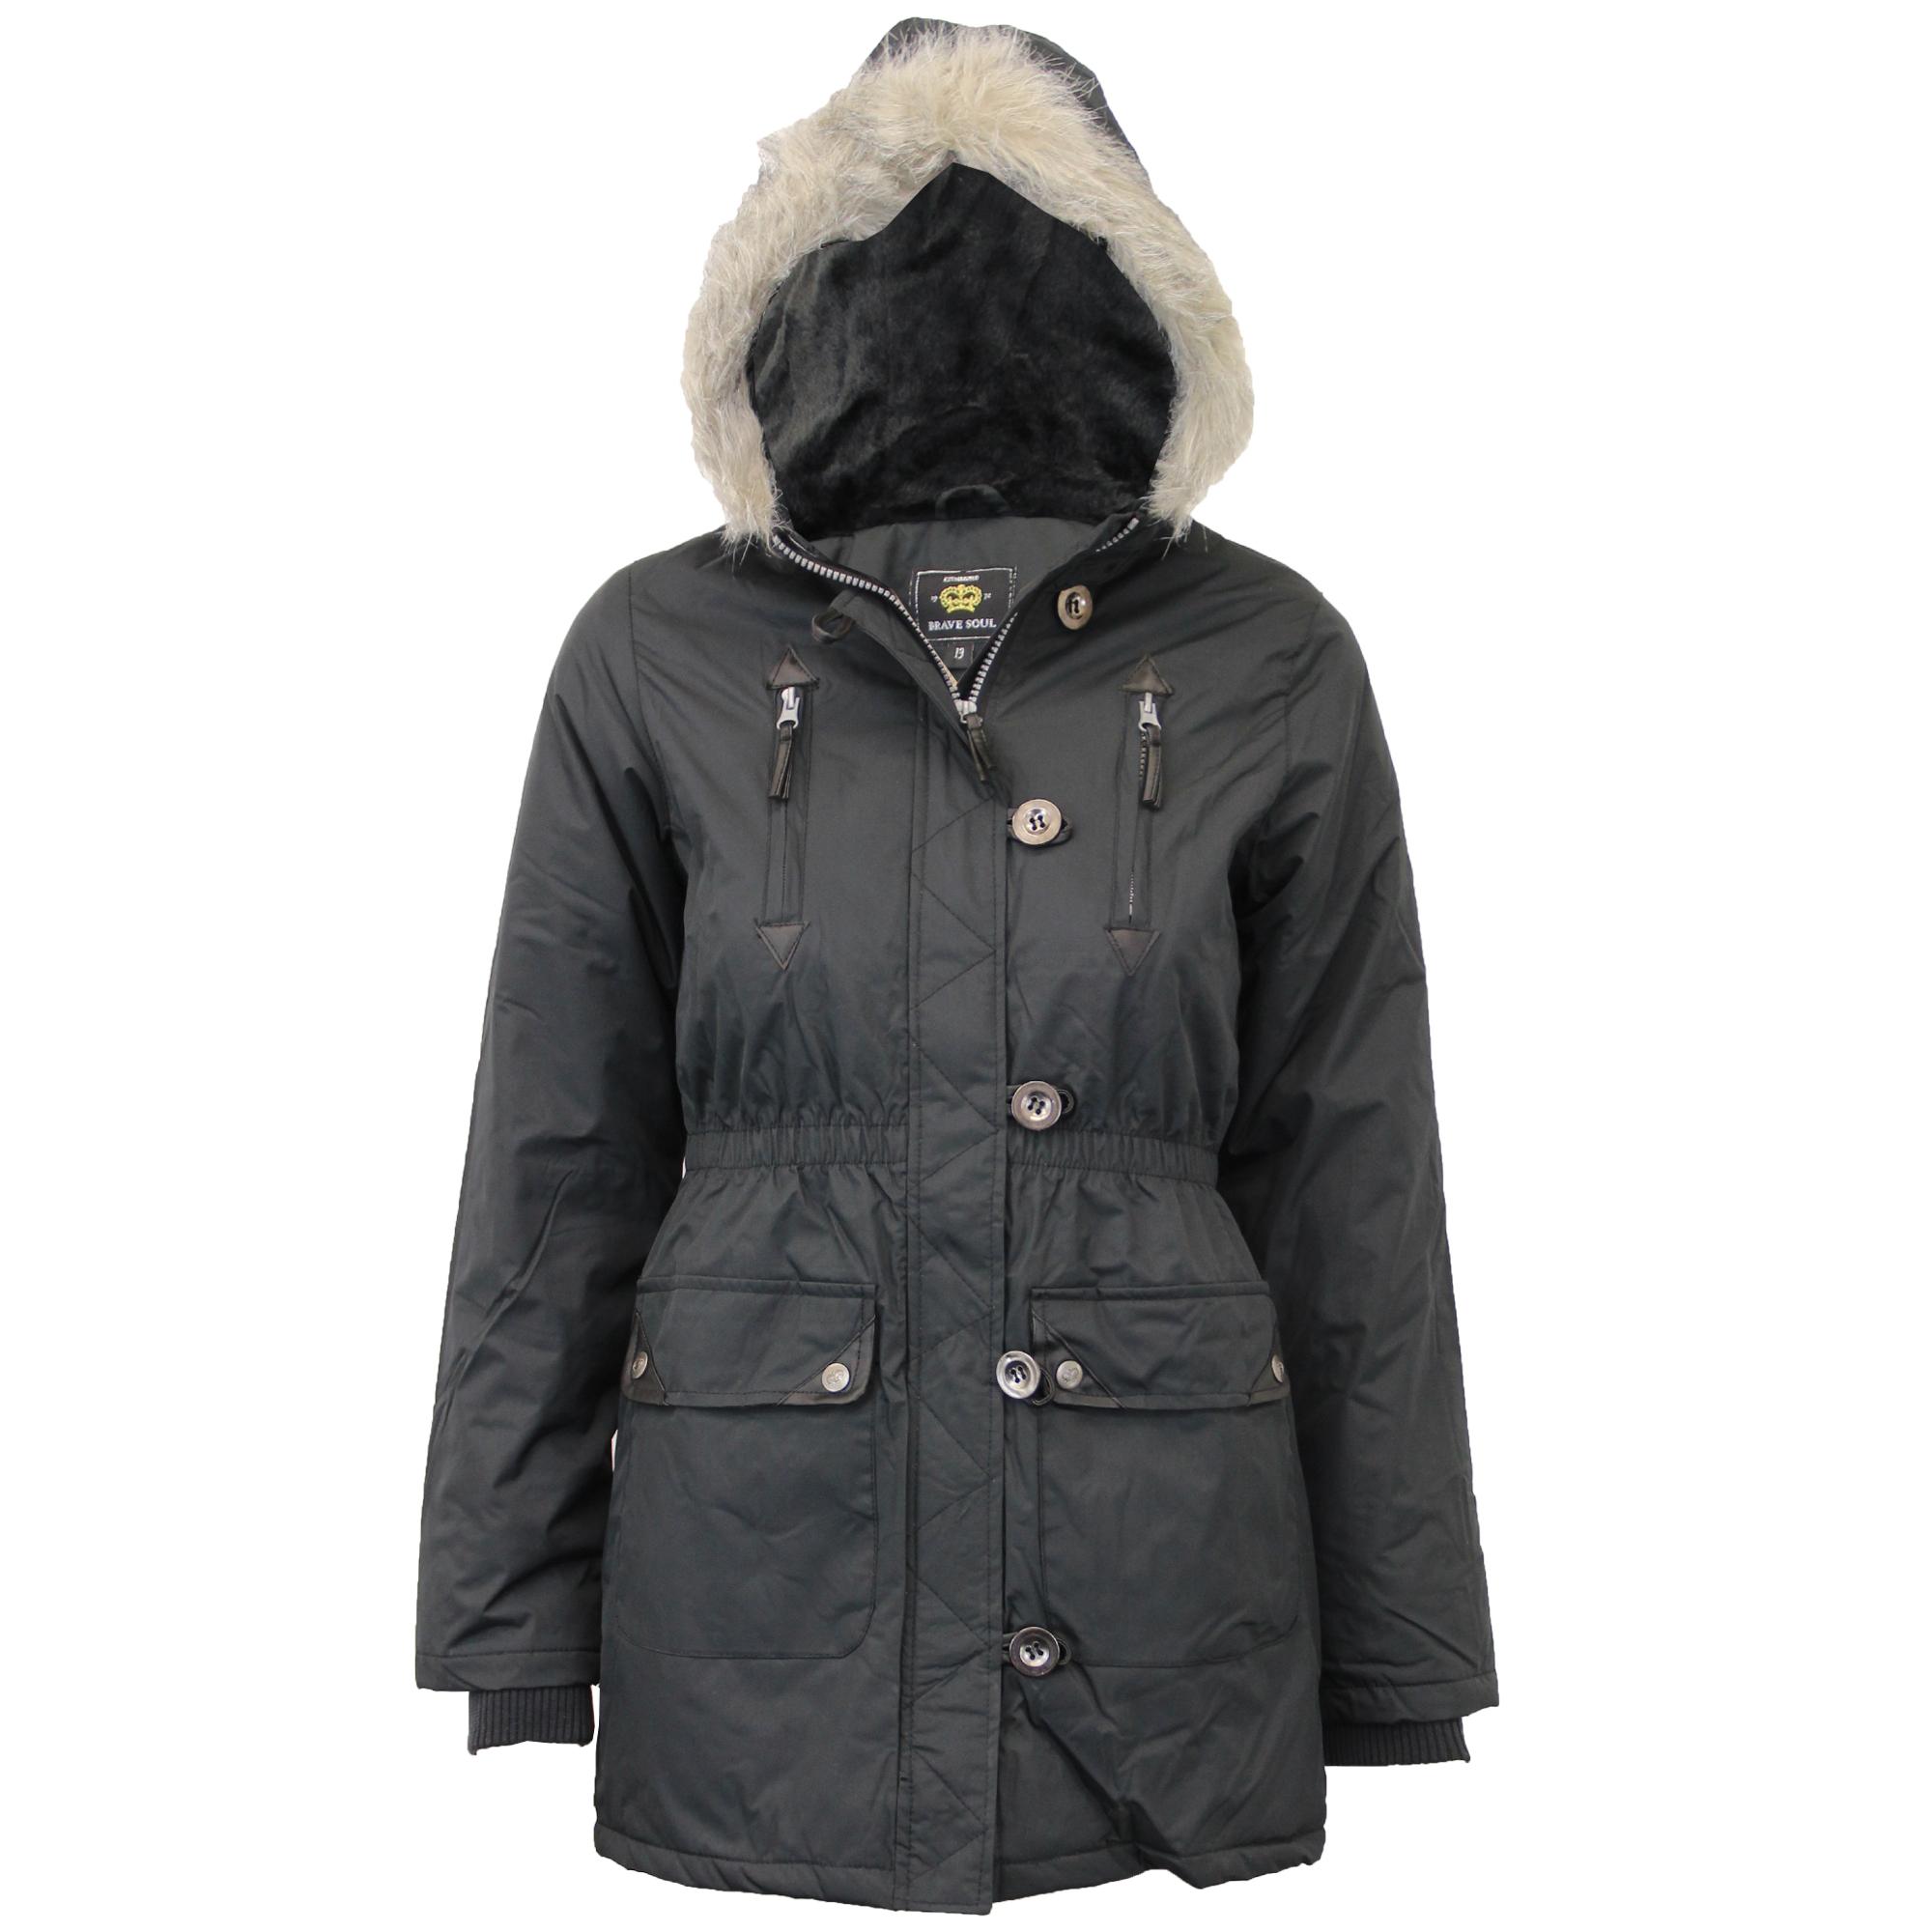 Girls Jacket Brave Soul Kids Parka School Coat Hooded ...